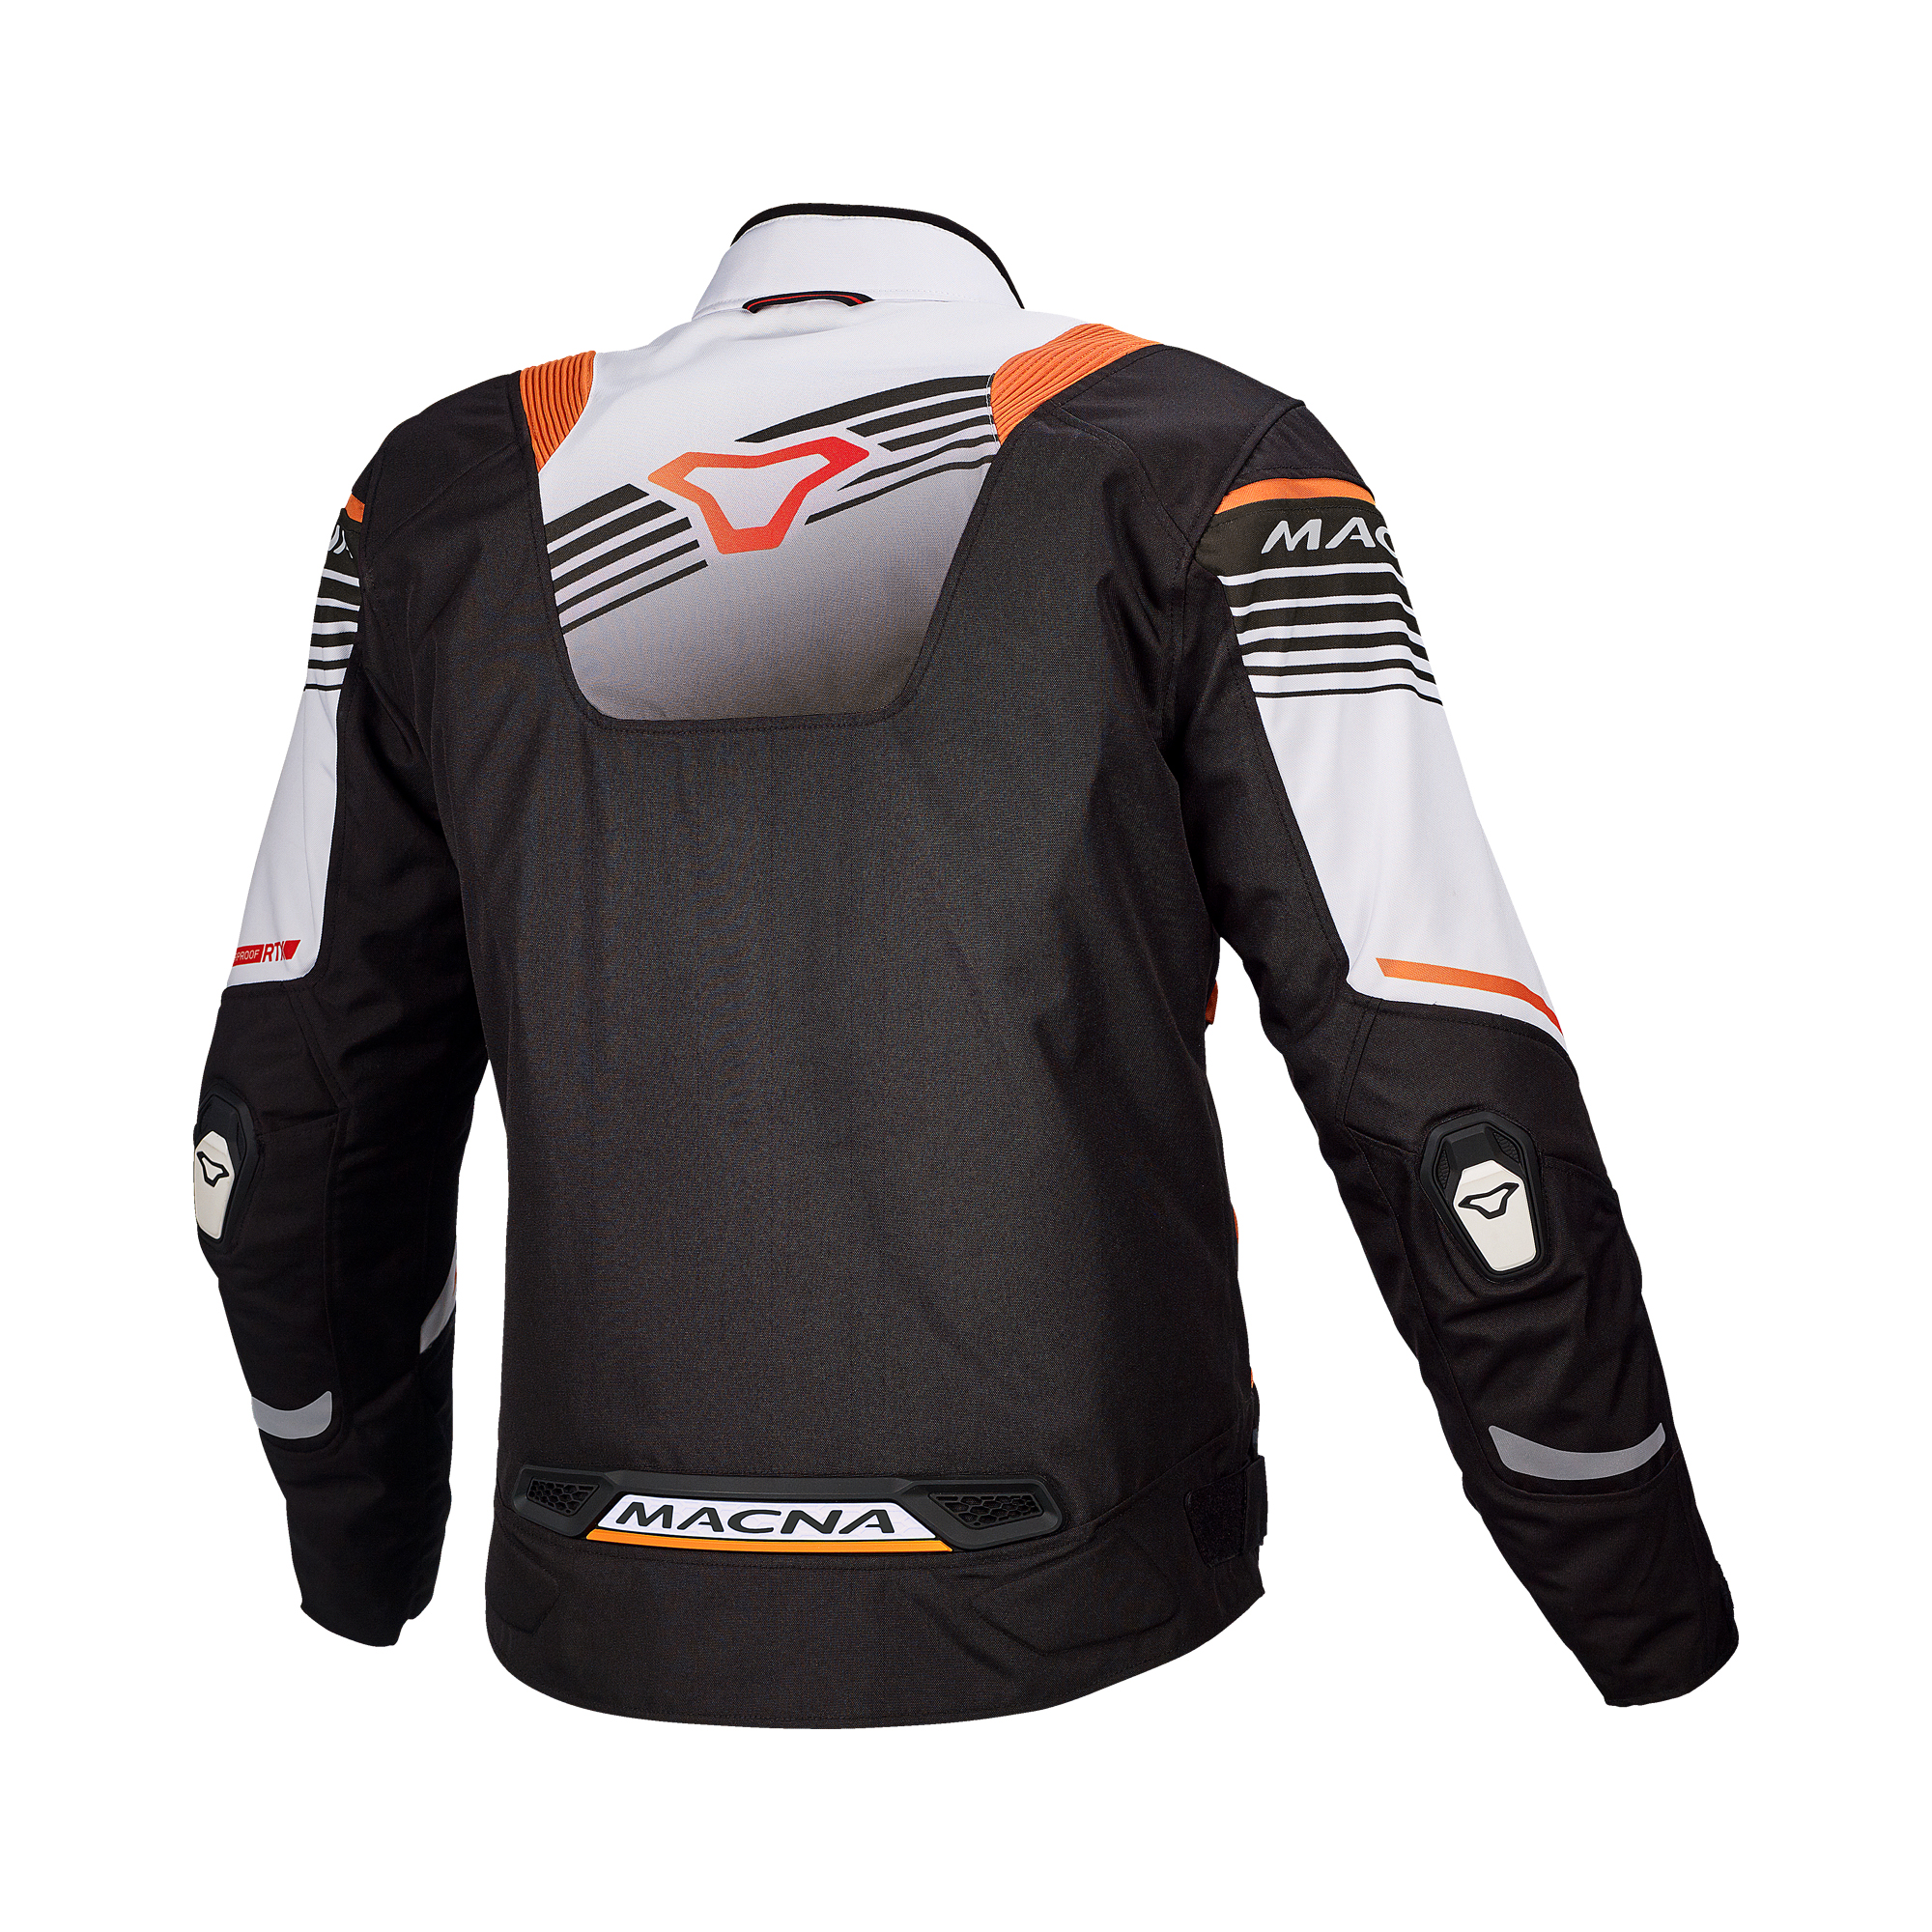 Macna motorcycle jacket - CHARGER